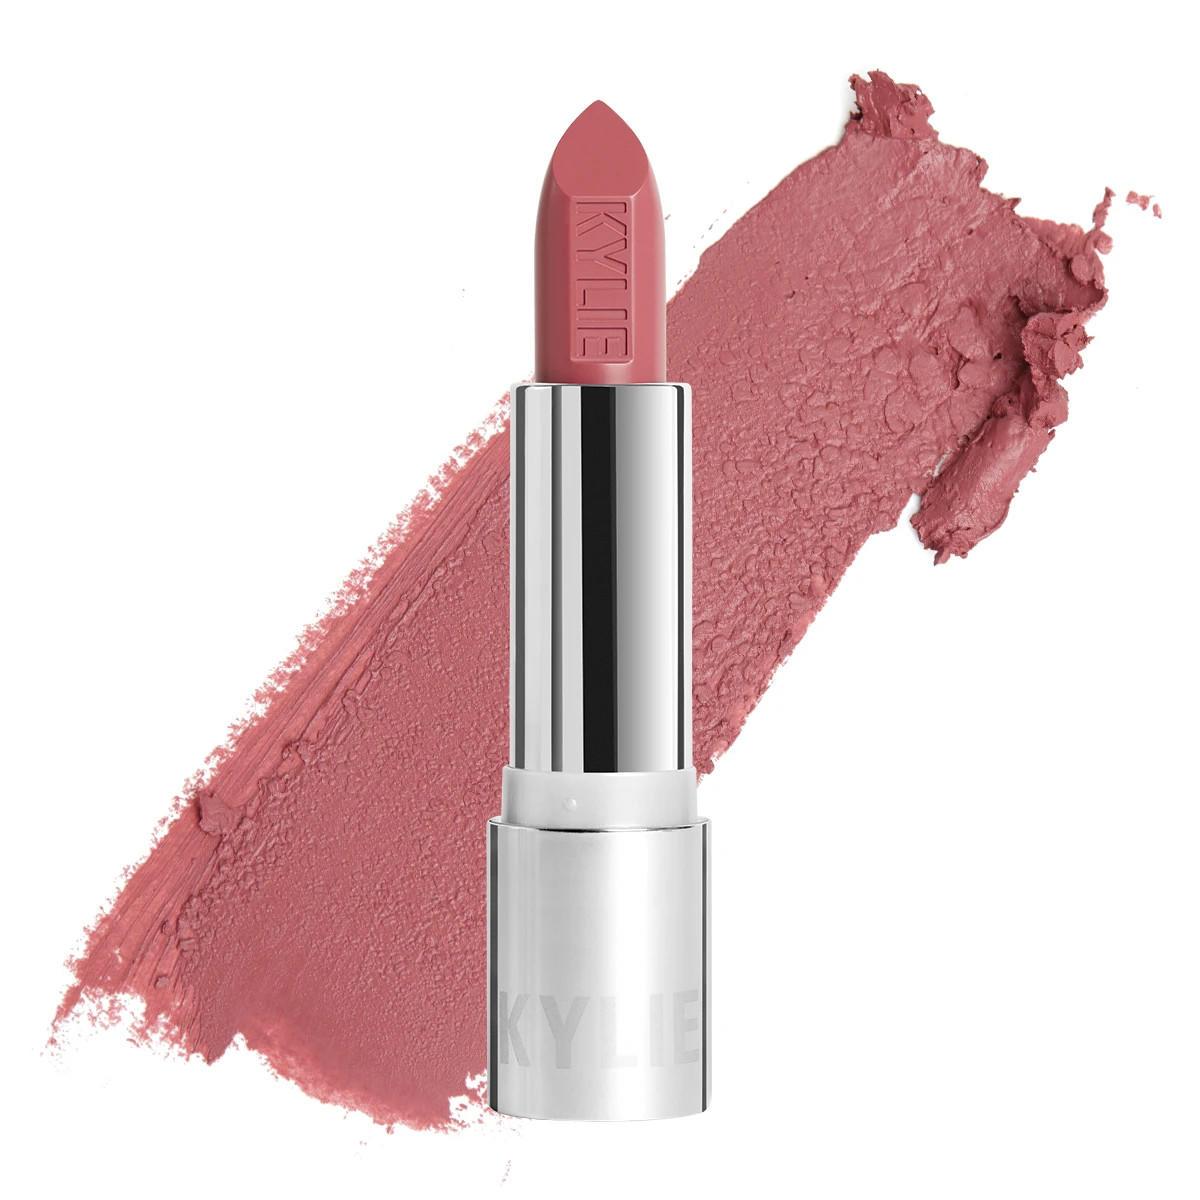 Kylie Cosmetics Creme Lipstick Passion